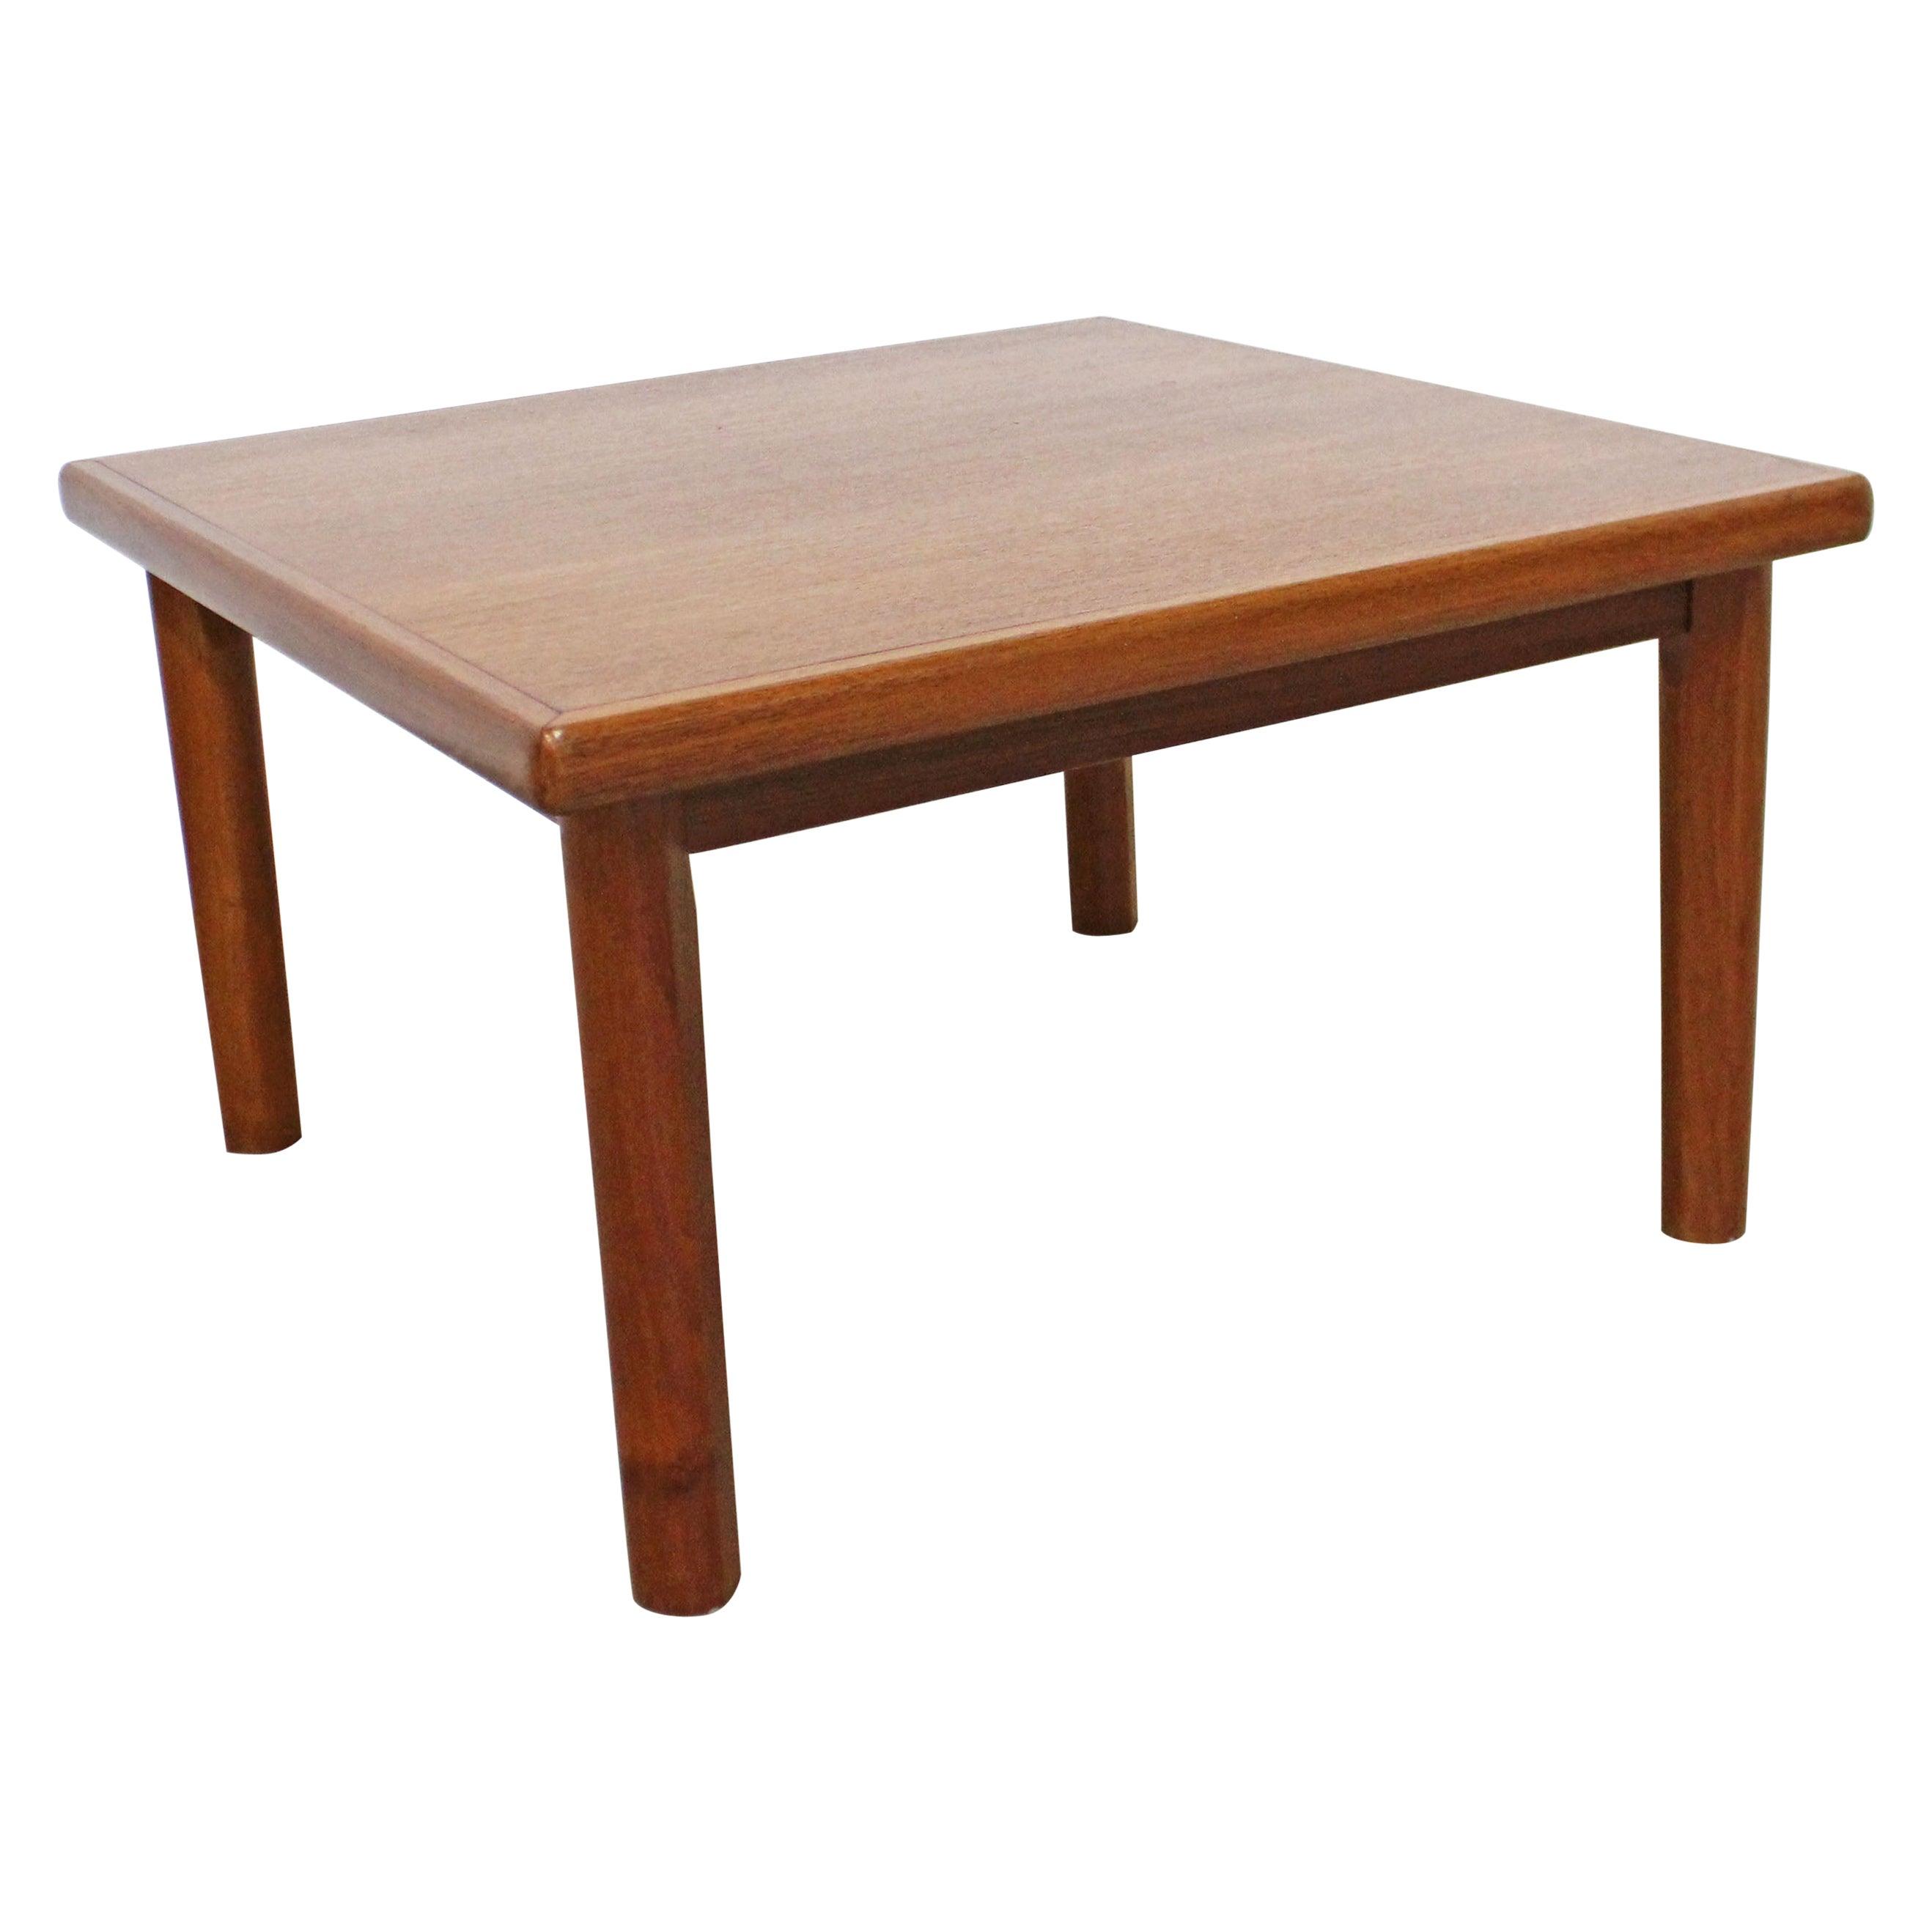 Danish Modern BRDR Furbo Square Teak Side/Coffee Table